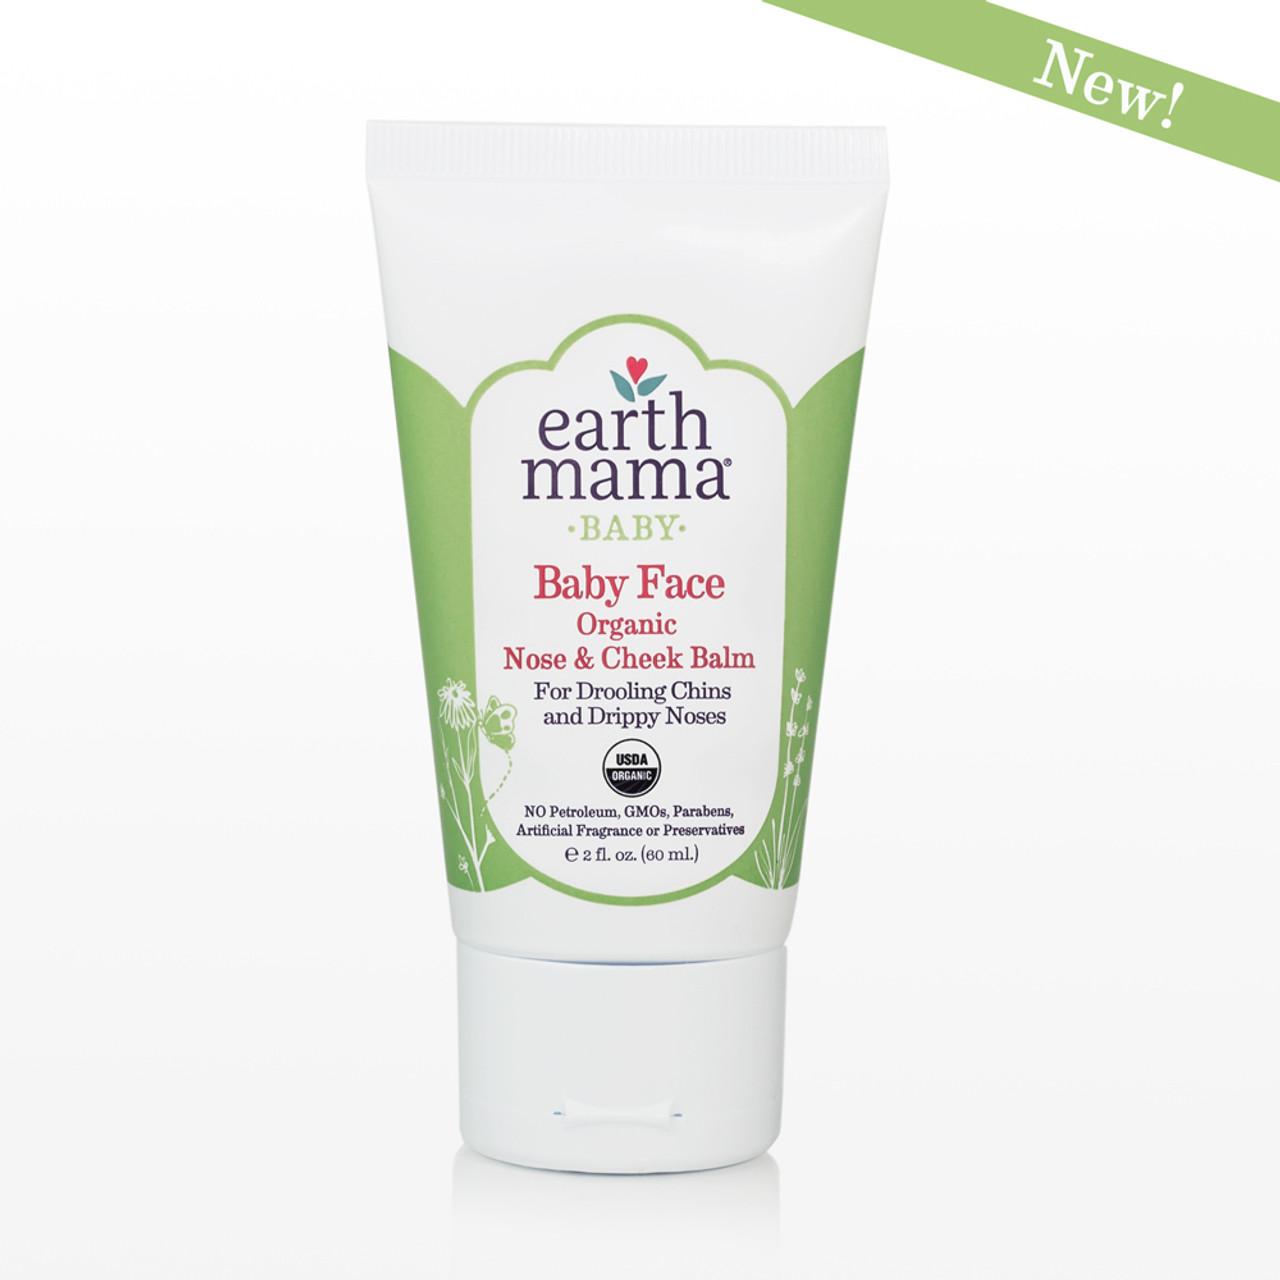 Baby Face Organic Nose & Cheek Balm from Earth Mama Organics